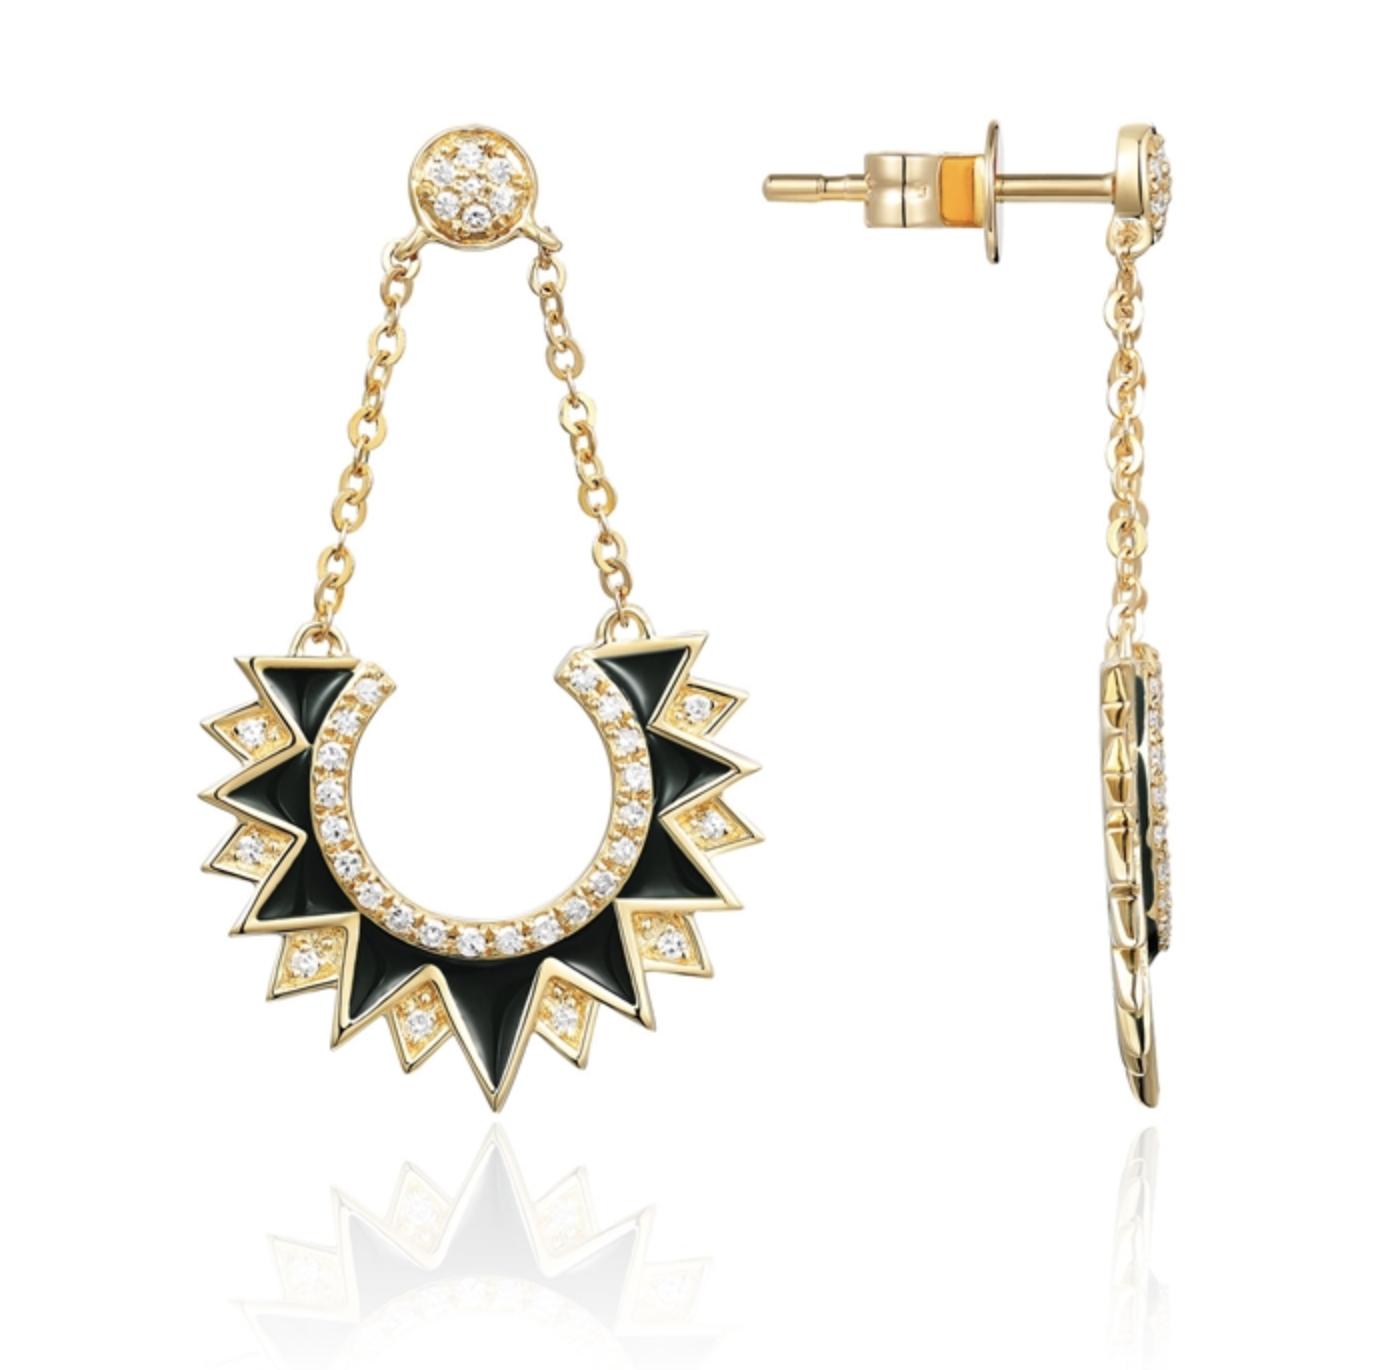 Black Enamel & Diamond Pave Chain Earrings